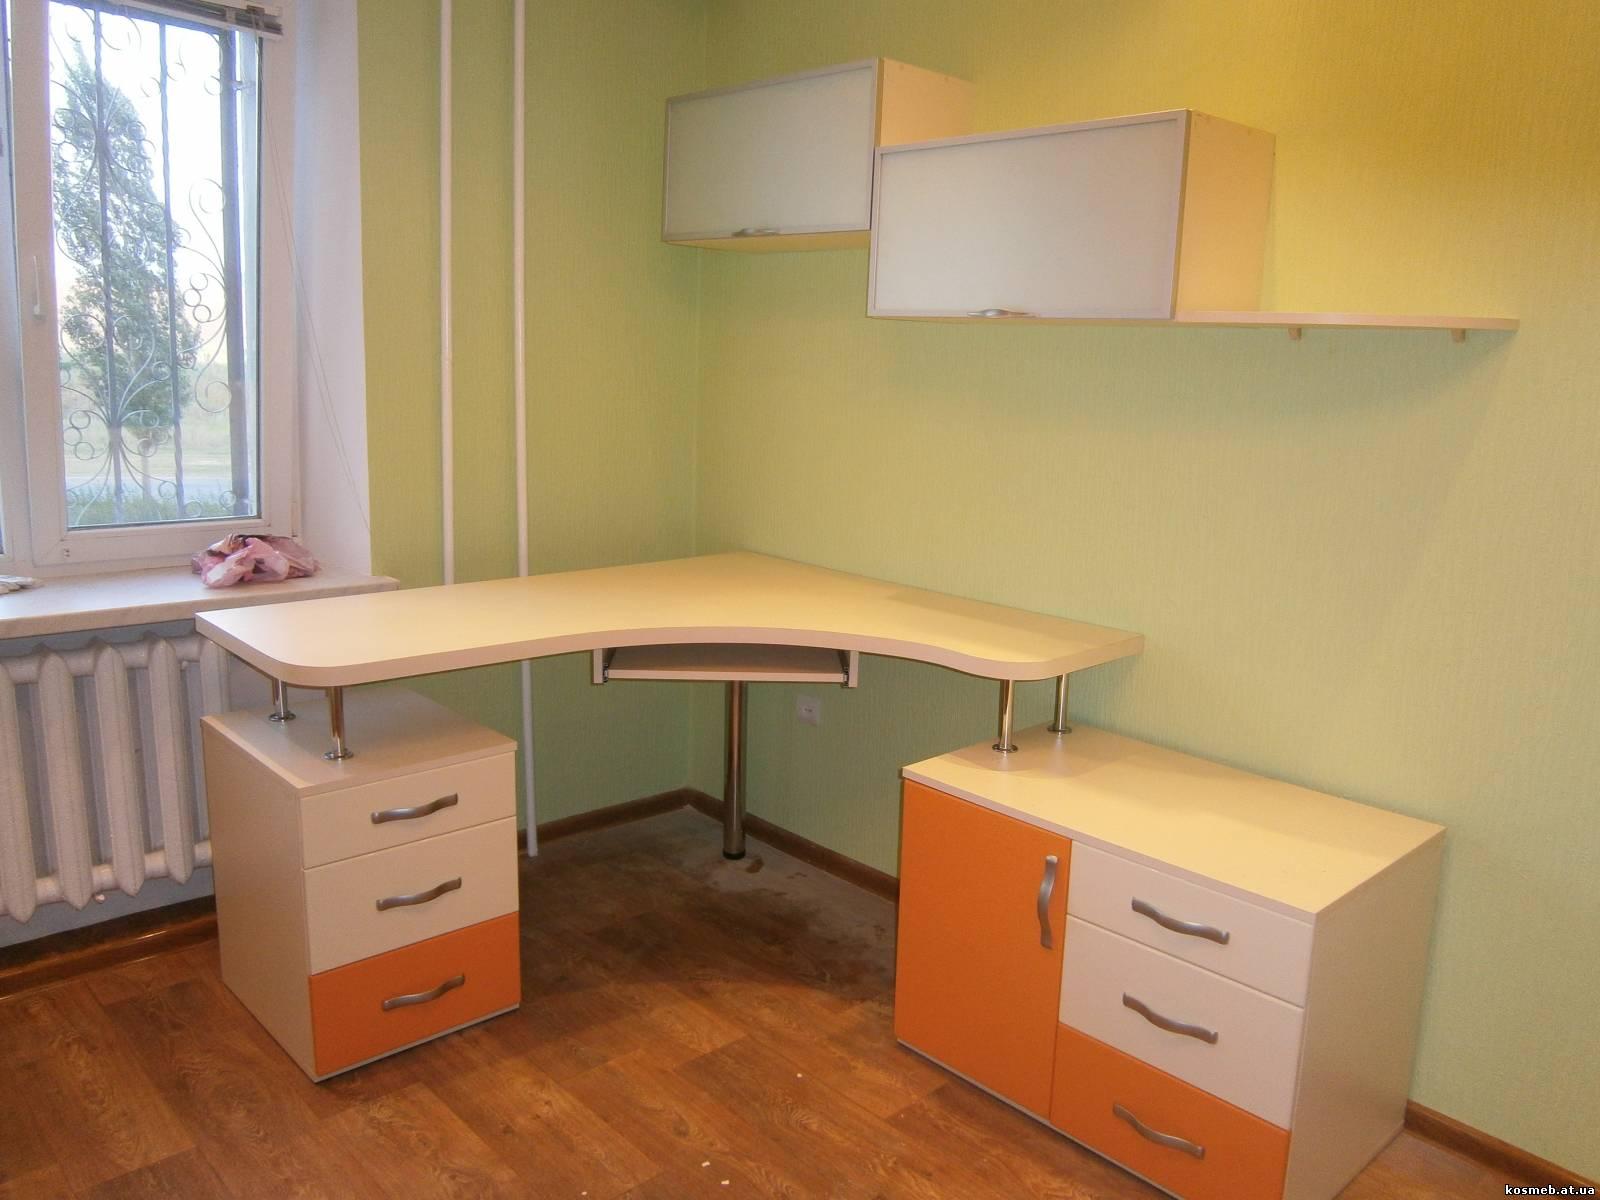 Кухни и другая мебель на заказ от новикова! страница 4.